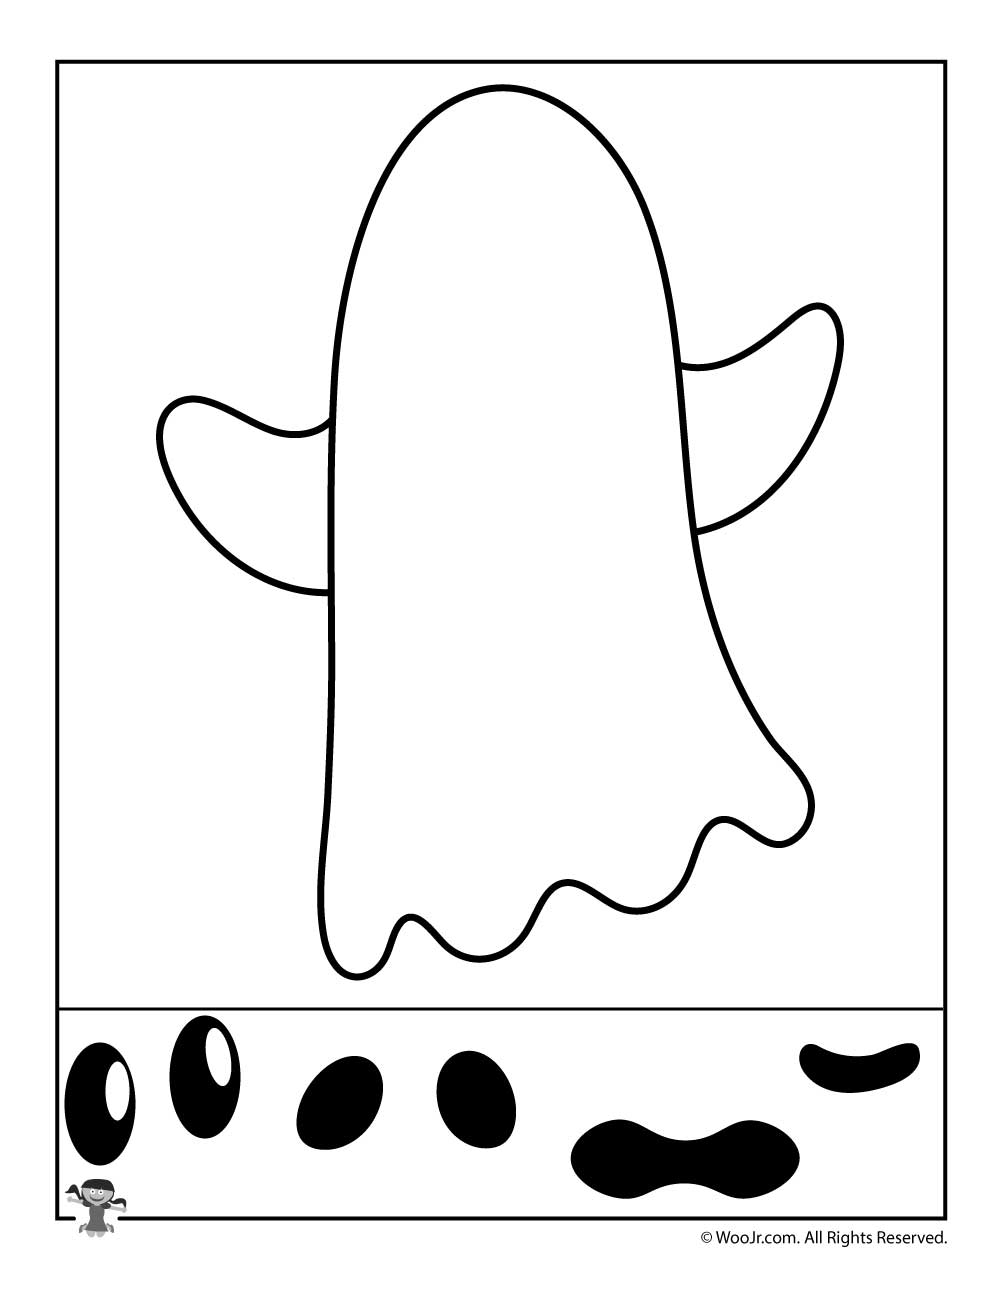 Ghost Cut and Paste Activity Sheet | Woo! Jr. Kids Activities